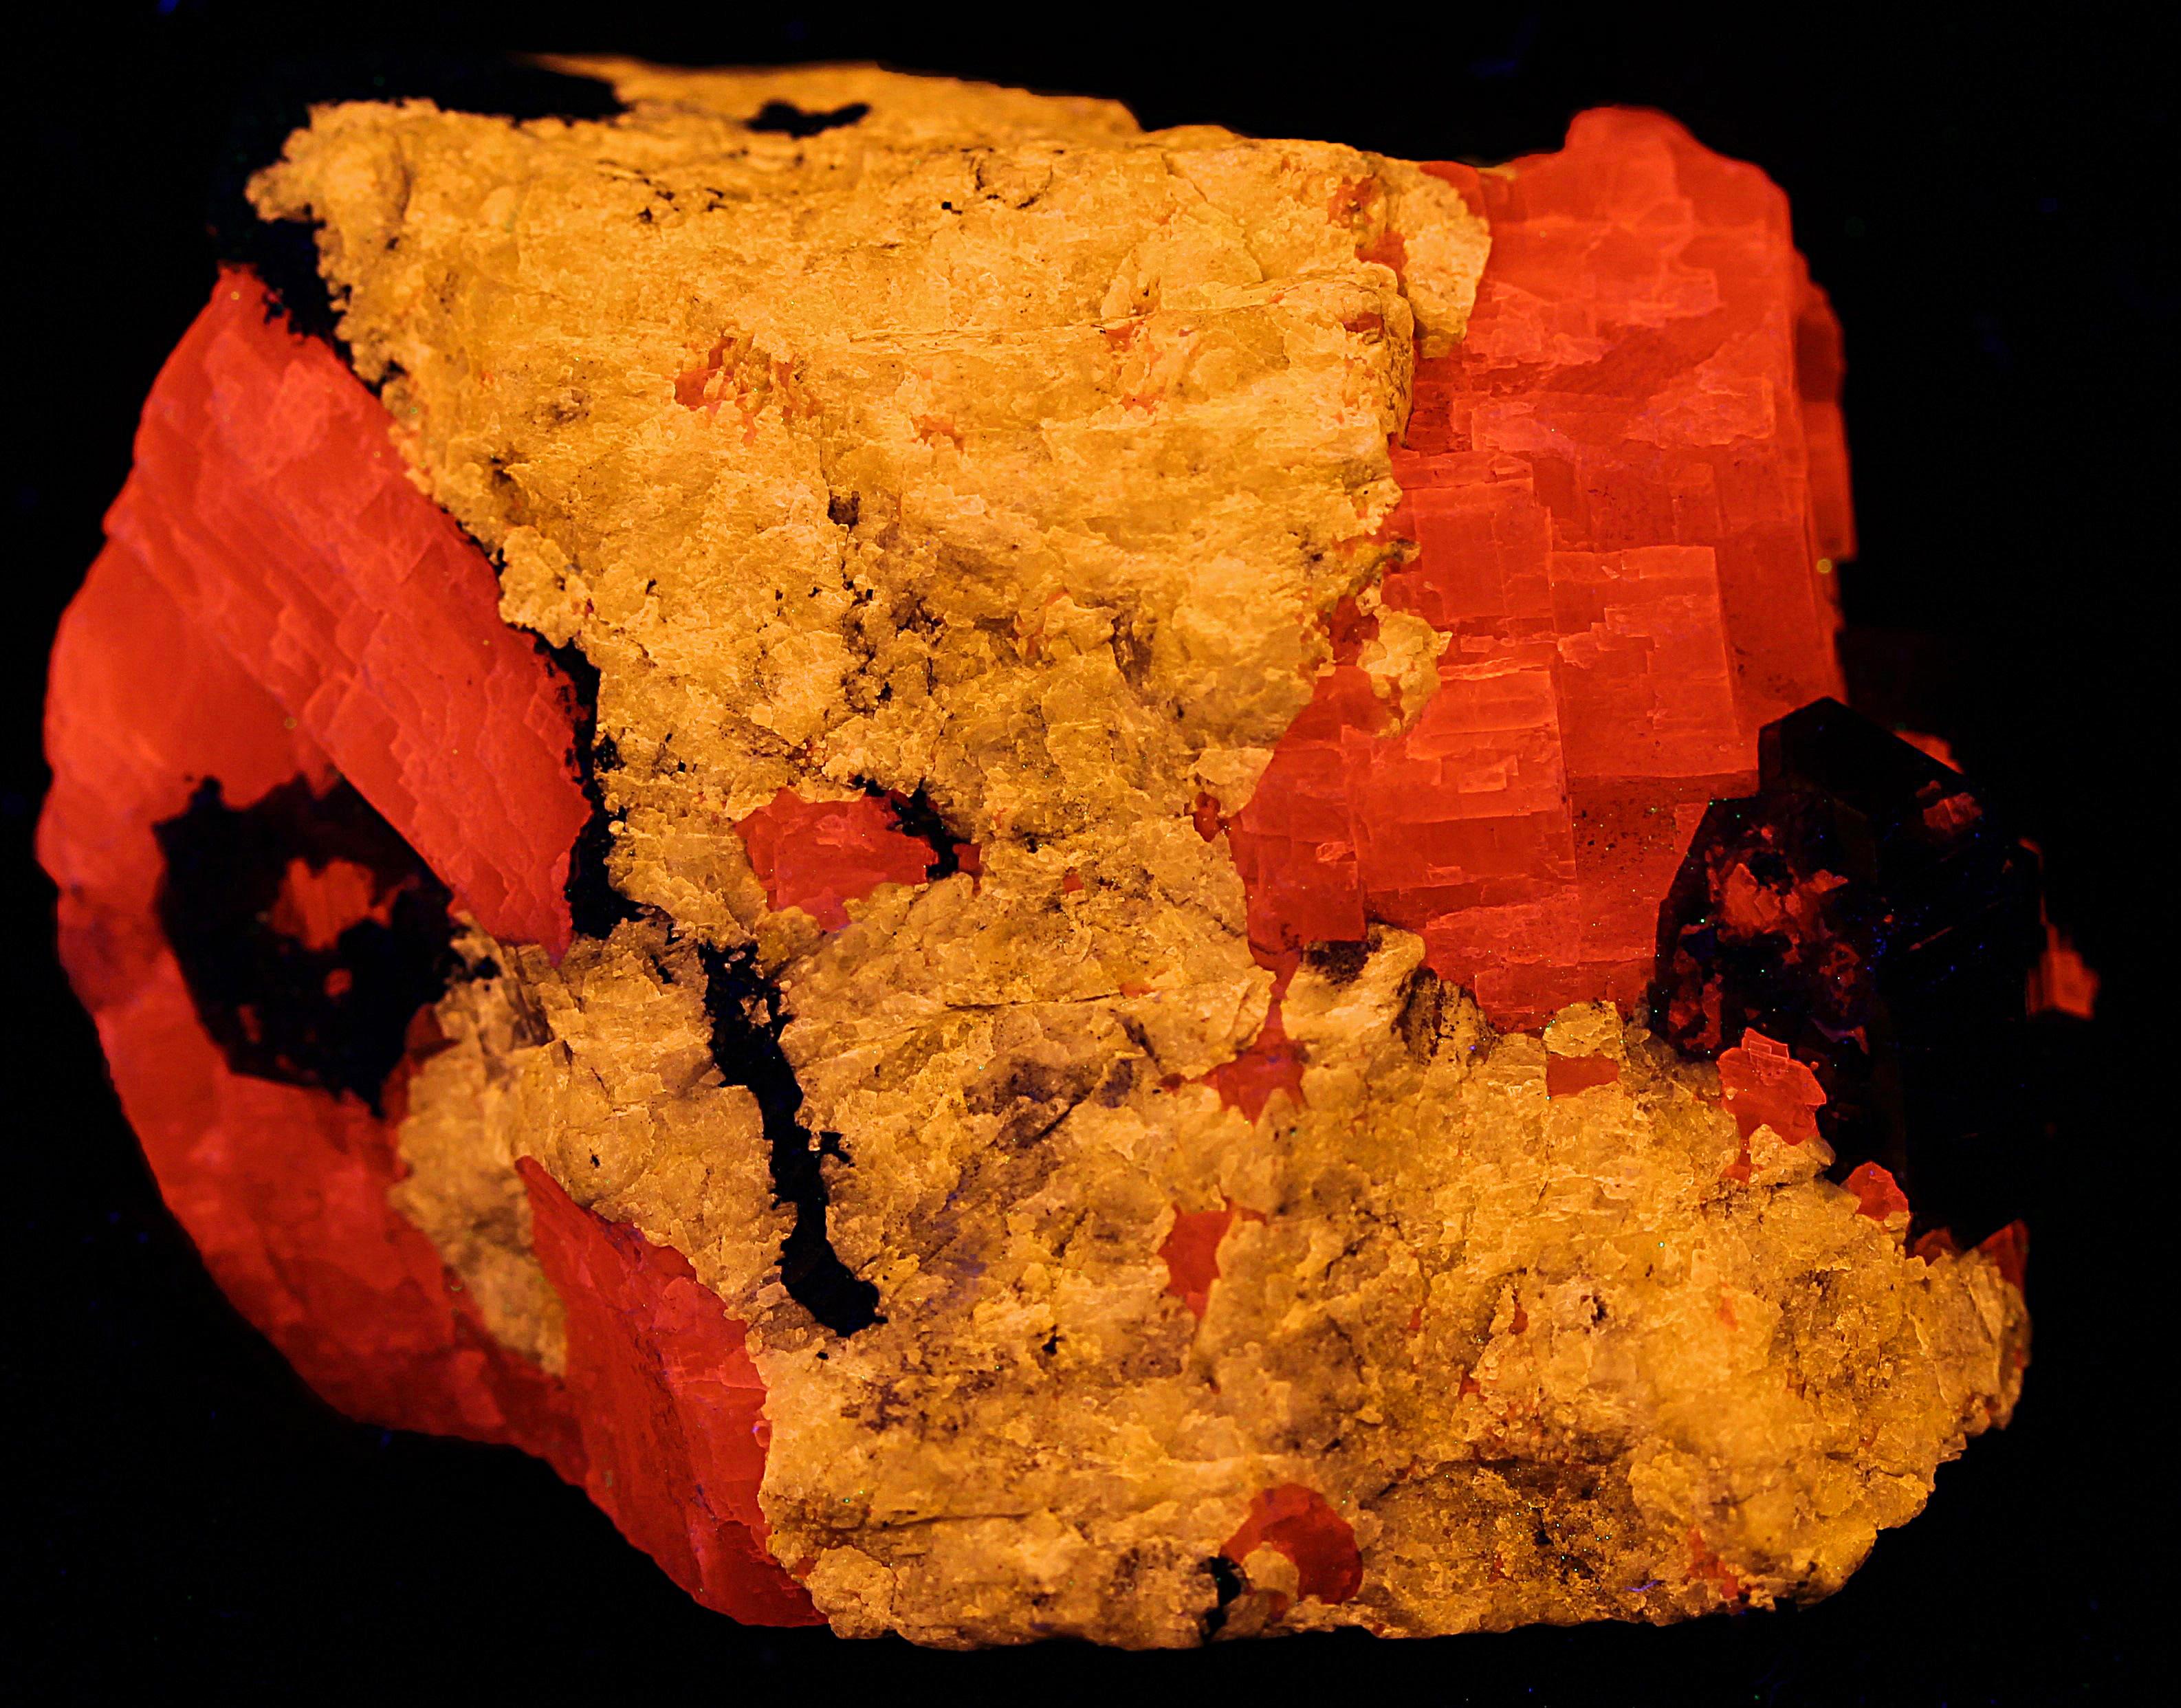 Turneaureite, calcite, andradite garnet, and franklinite from Franklin, NJ under shortwave UV Light